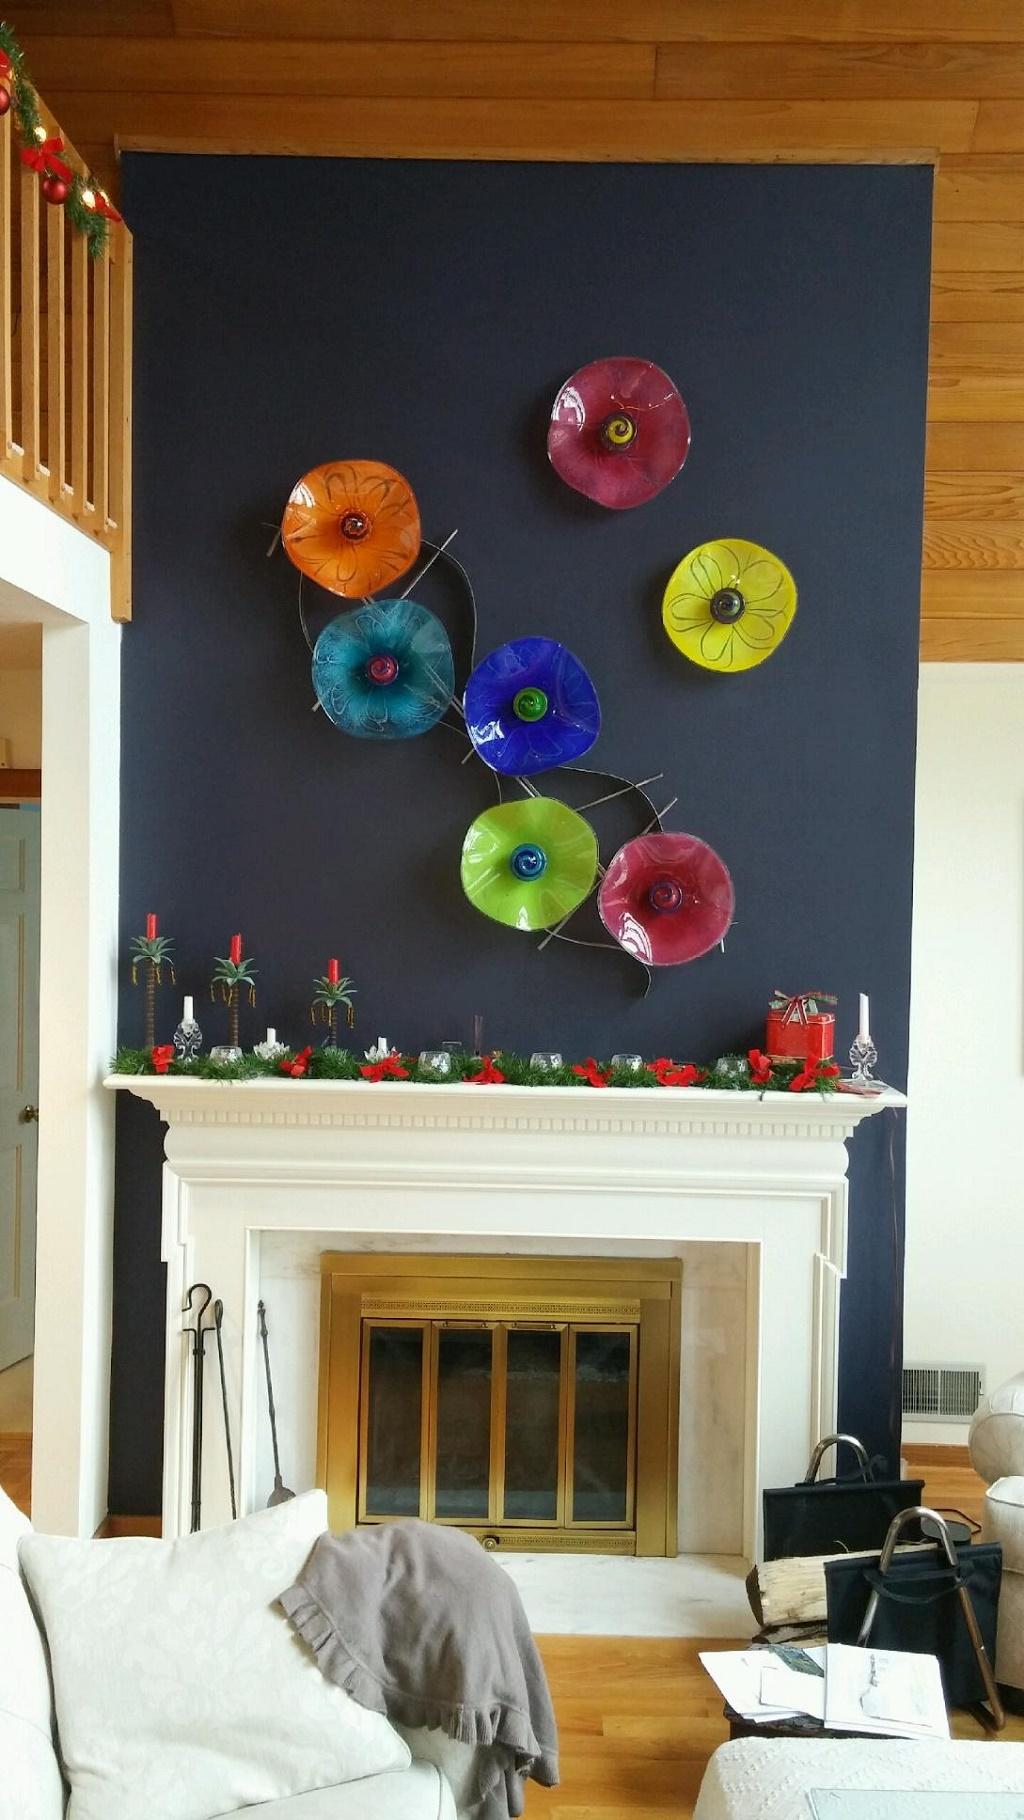 Copy of healing art glass wall flowers